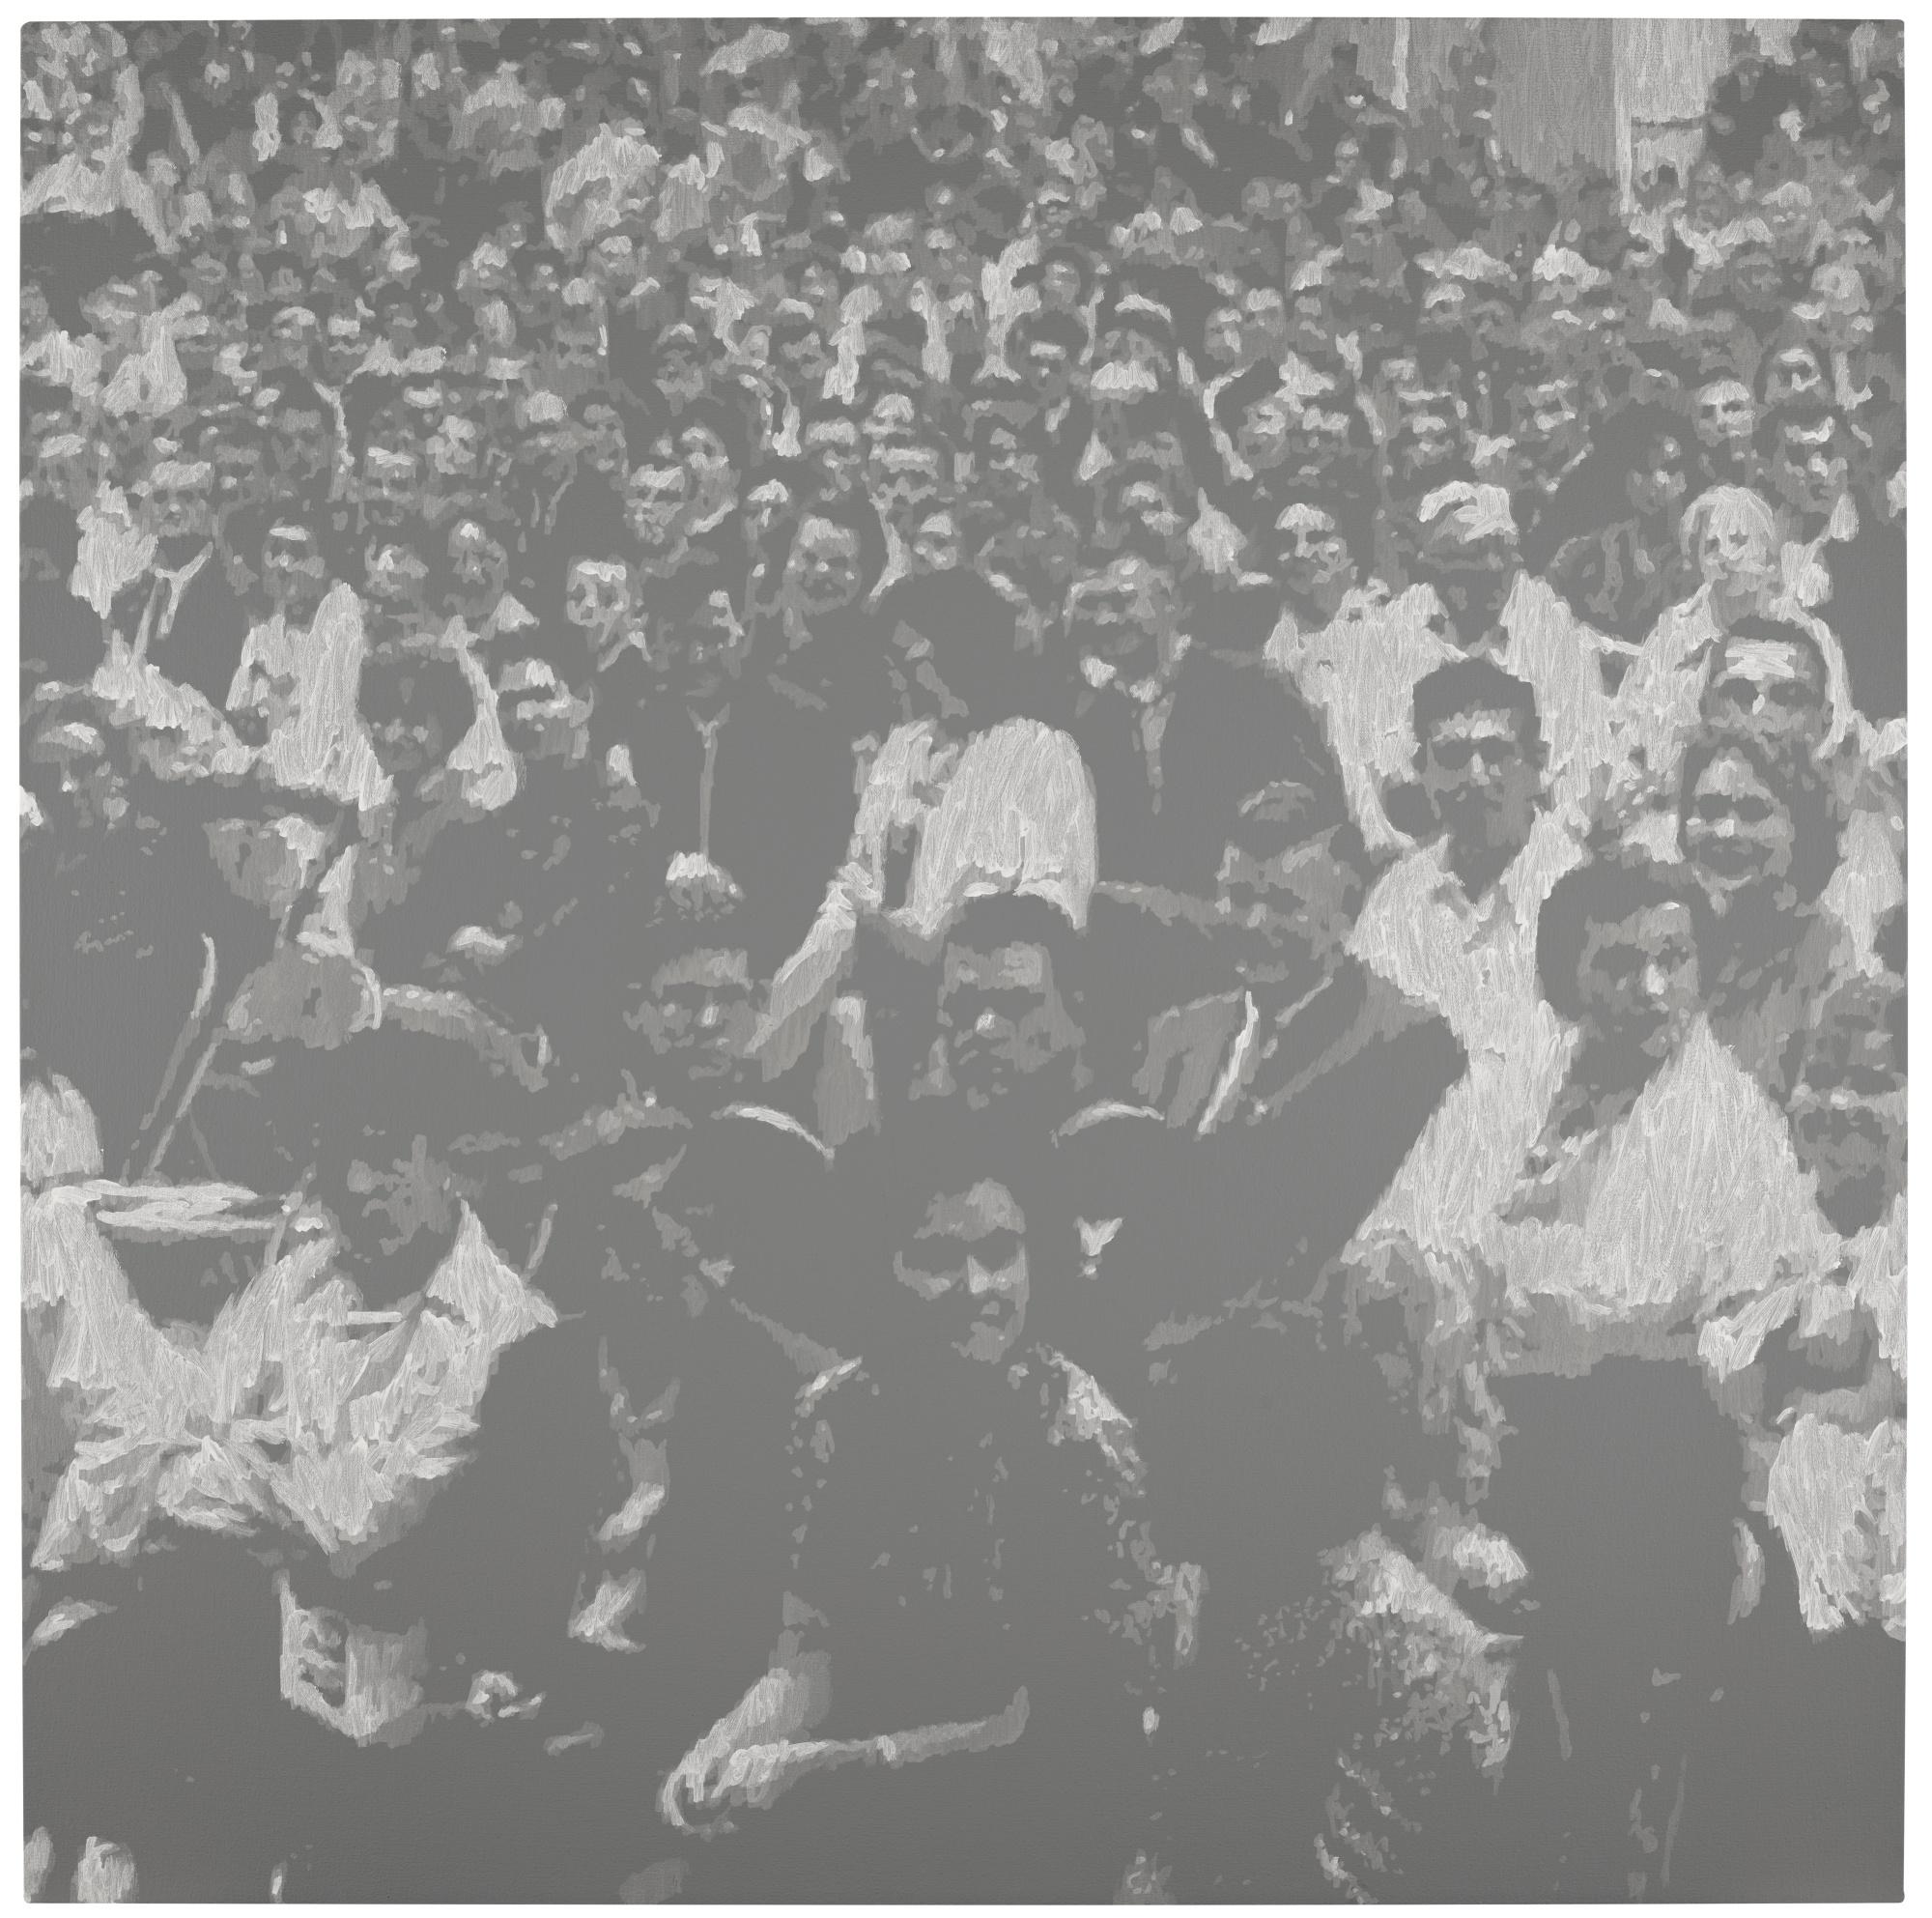 Wayne Gonzales-Seated Crowd-2008